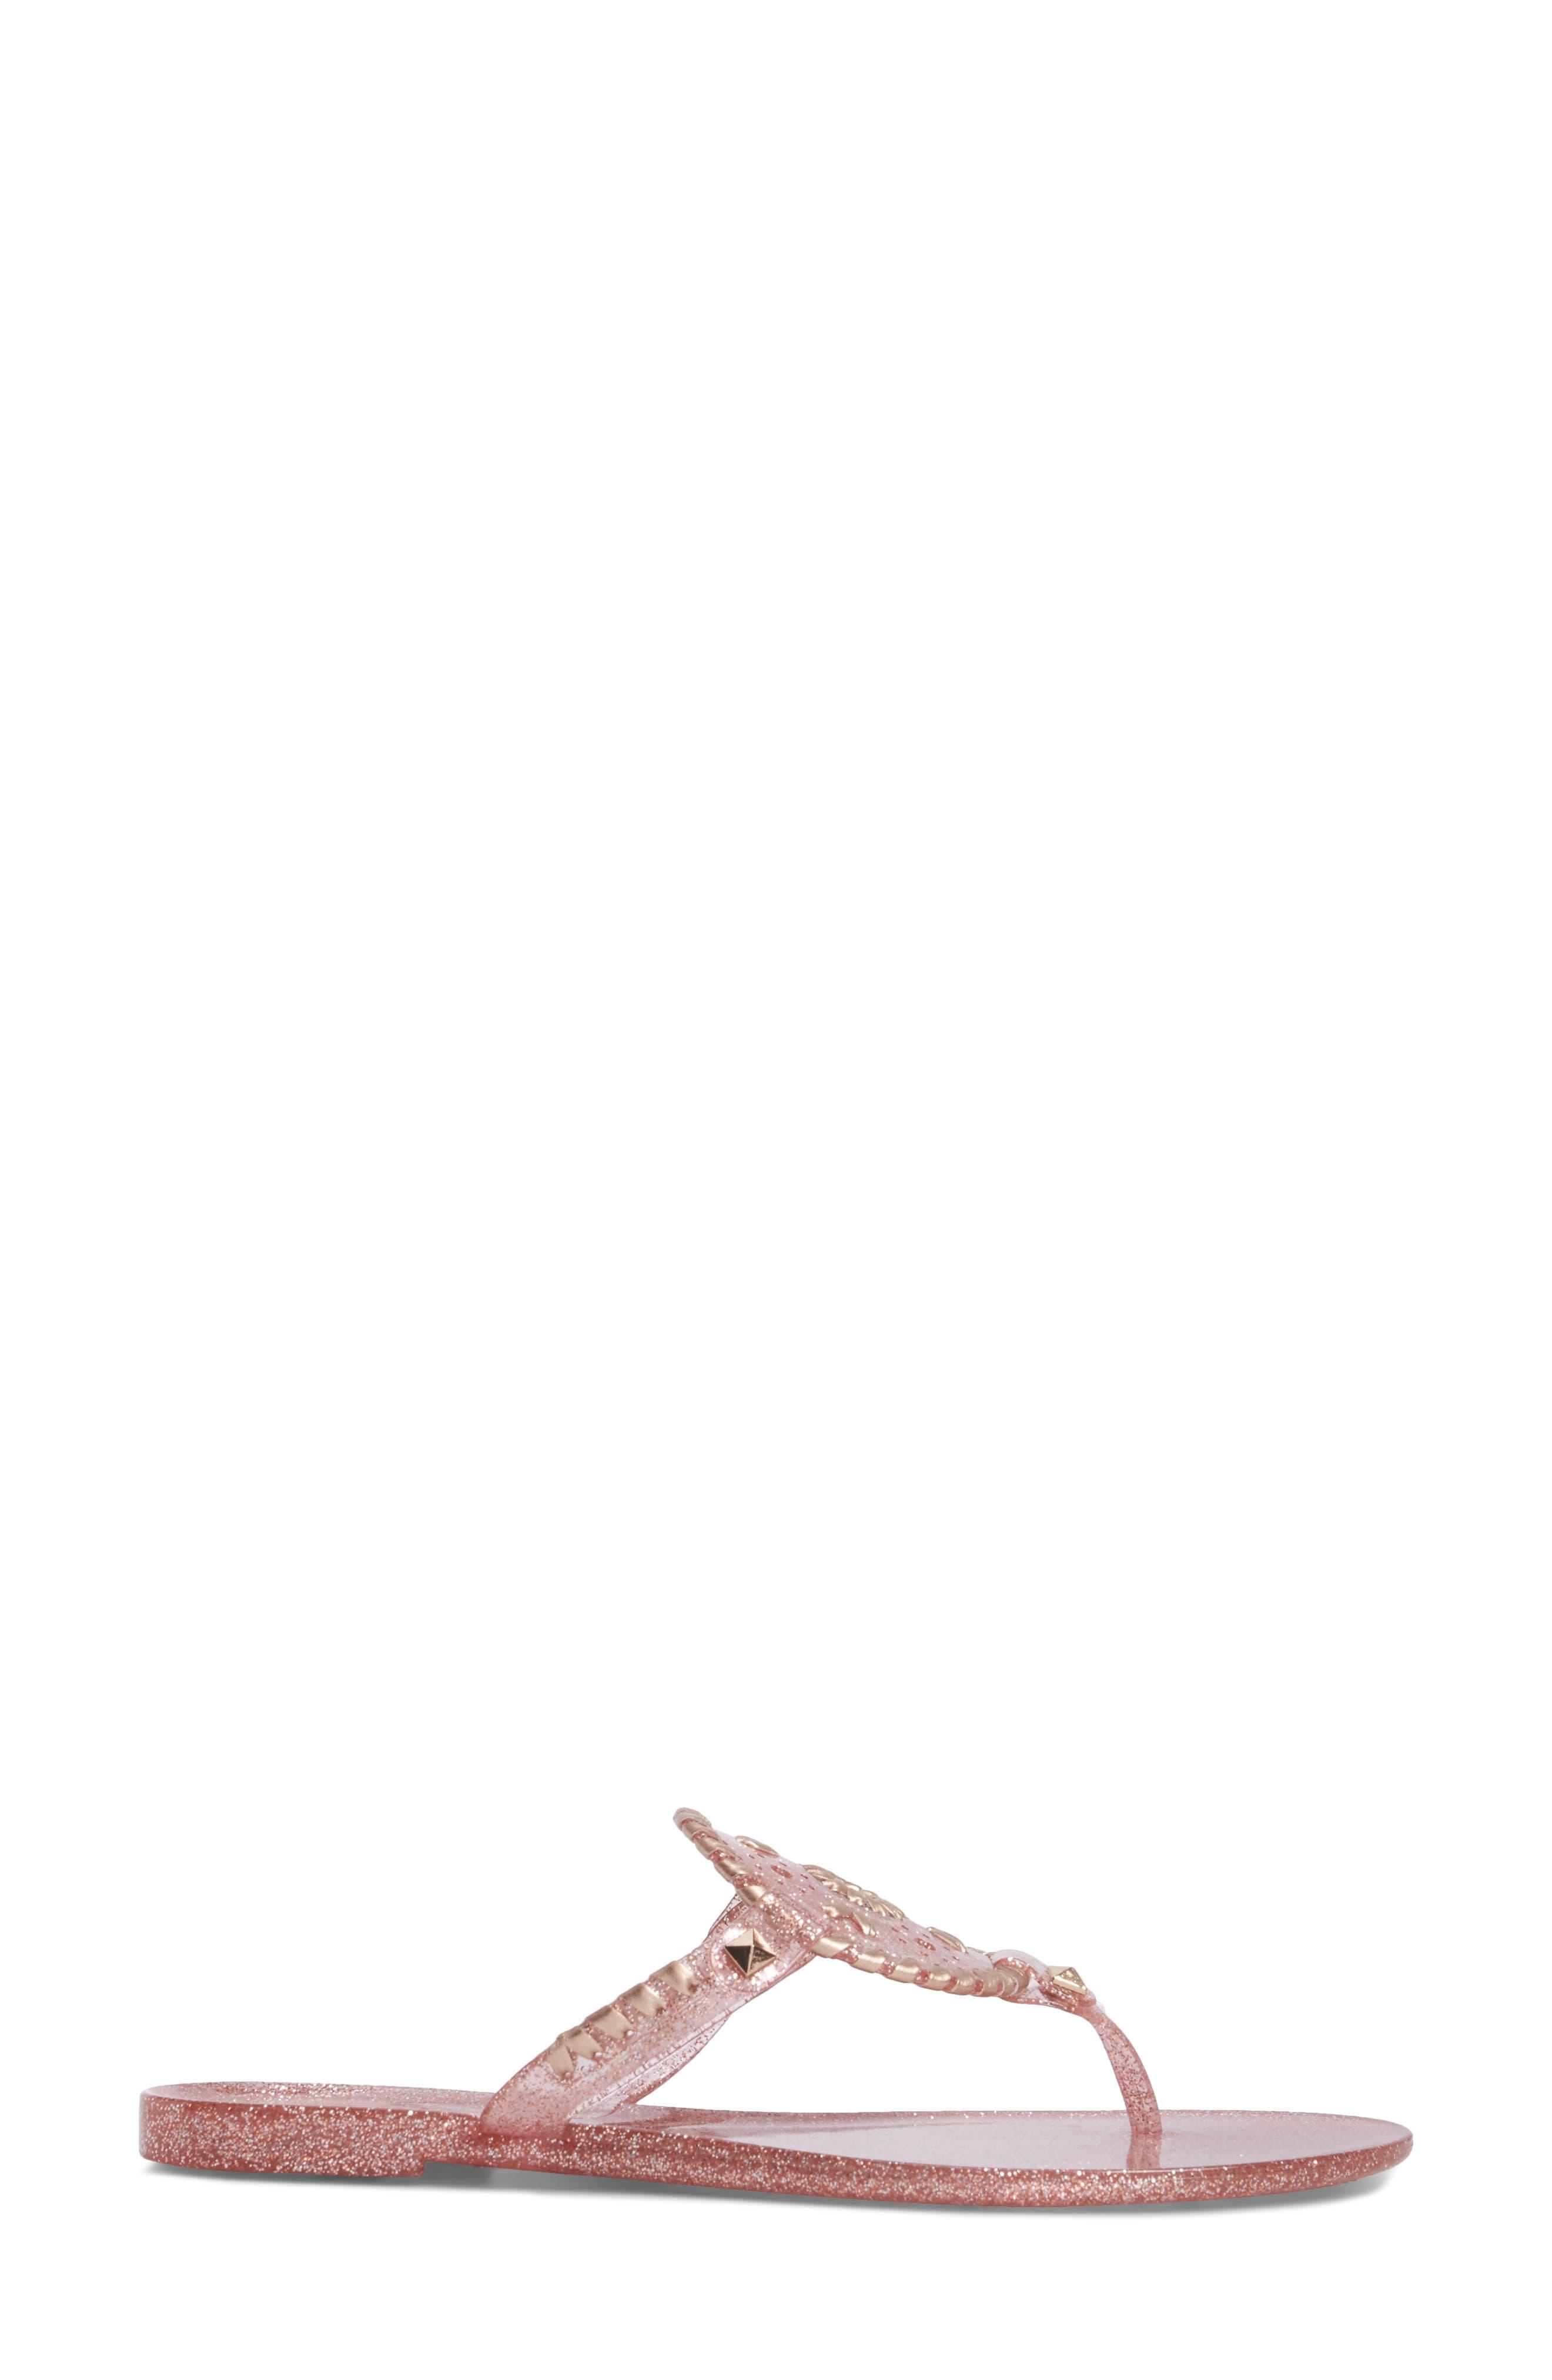 Alternate Image 3  - Jack Rogers 'Georgica' Jelly Flip Flop (Women)